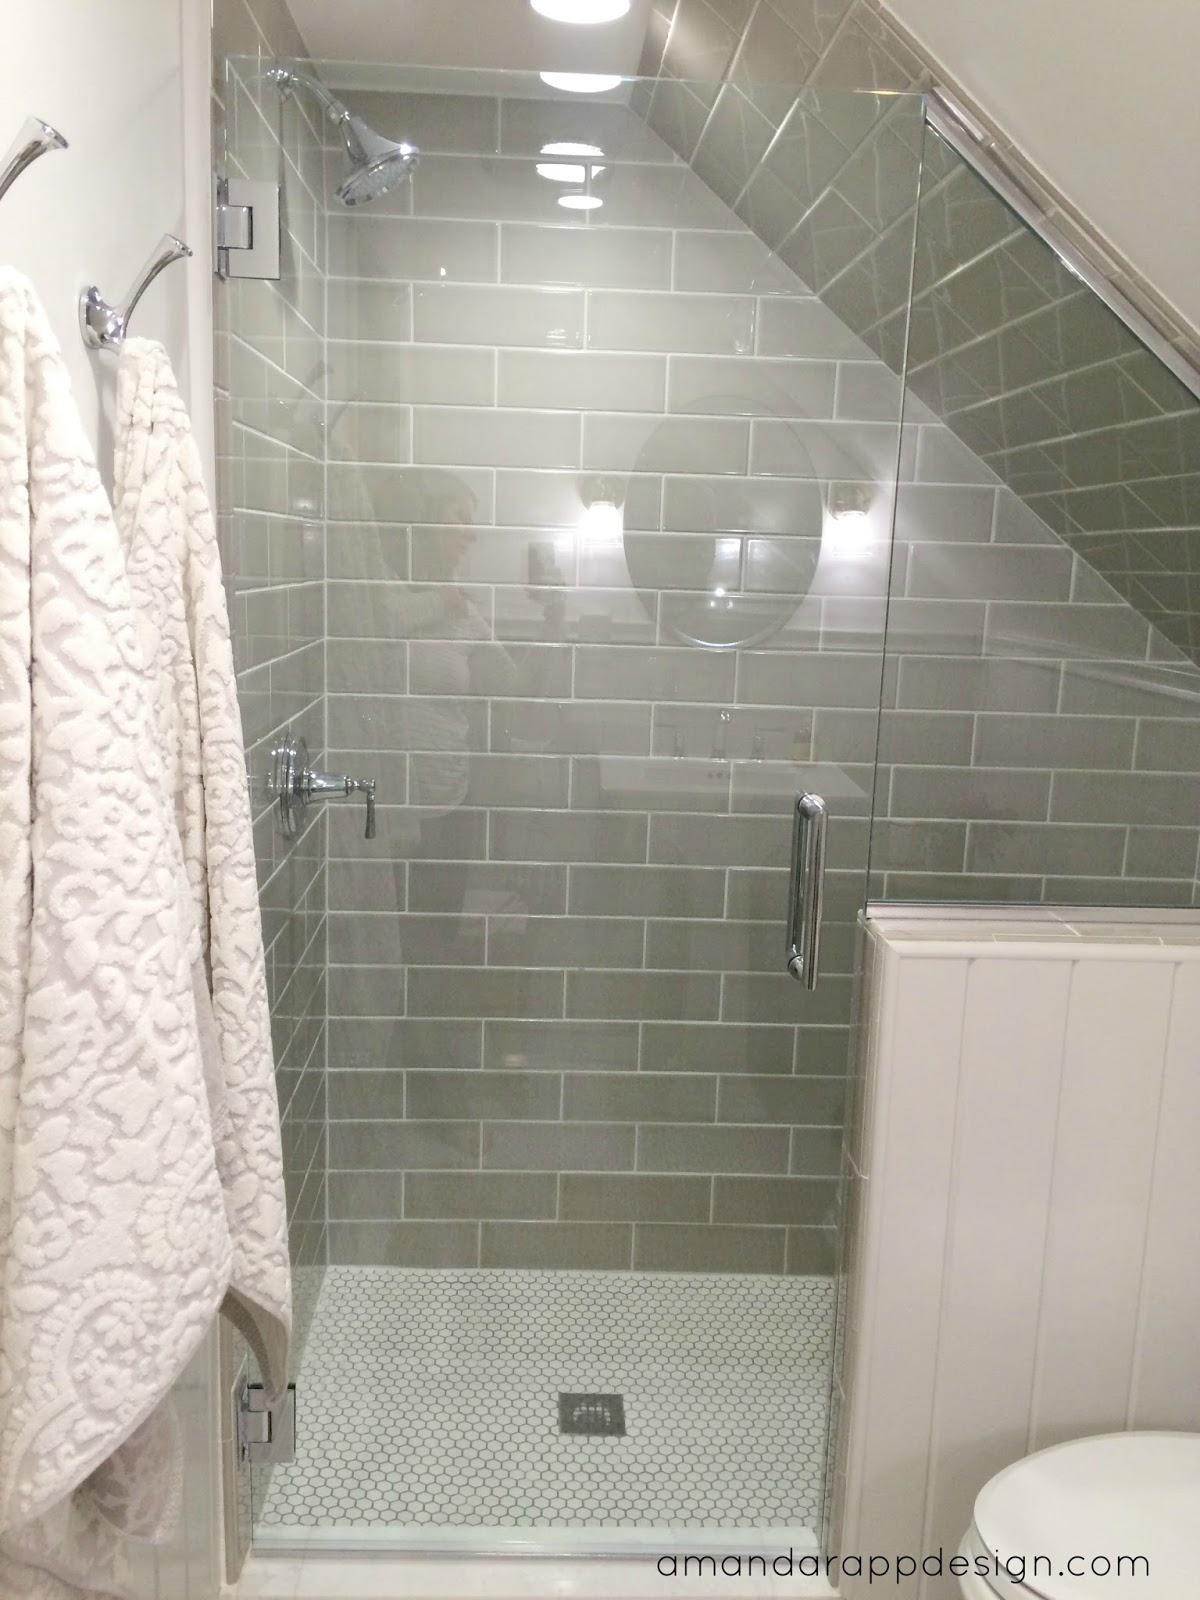 Install Kohler Kitchen Faucet Amanda Rapp Design Finished Classic Cottagey Bathroom